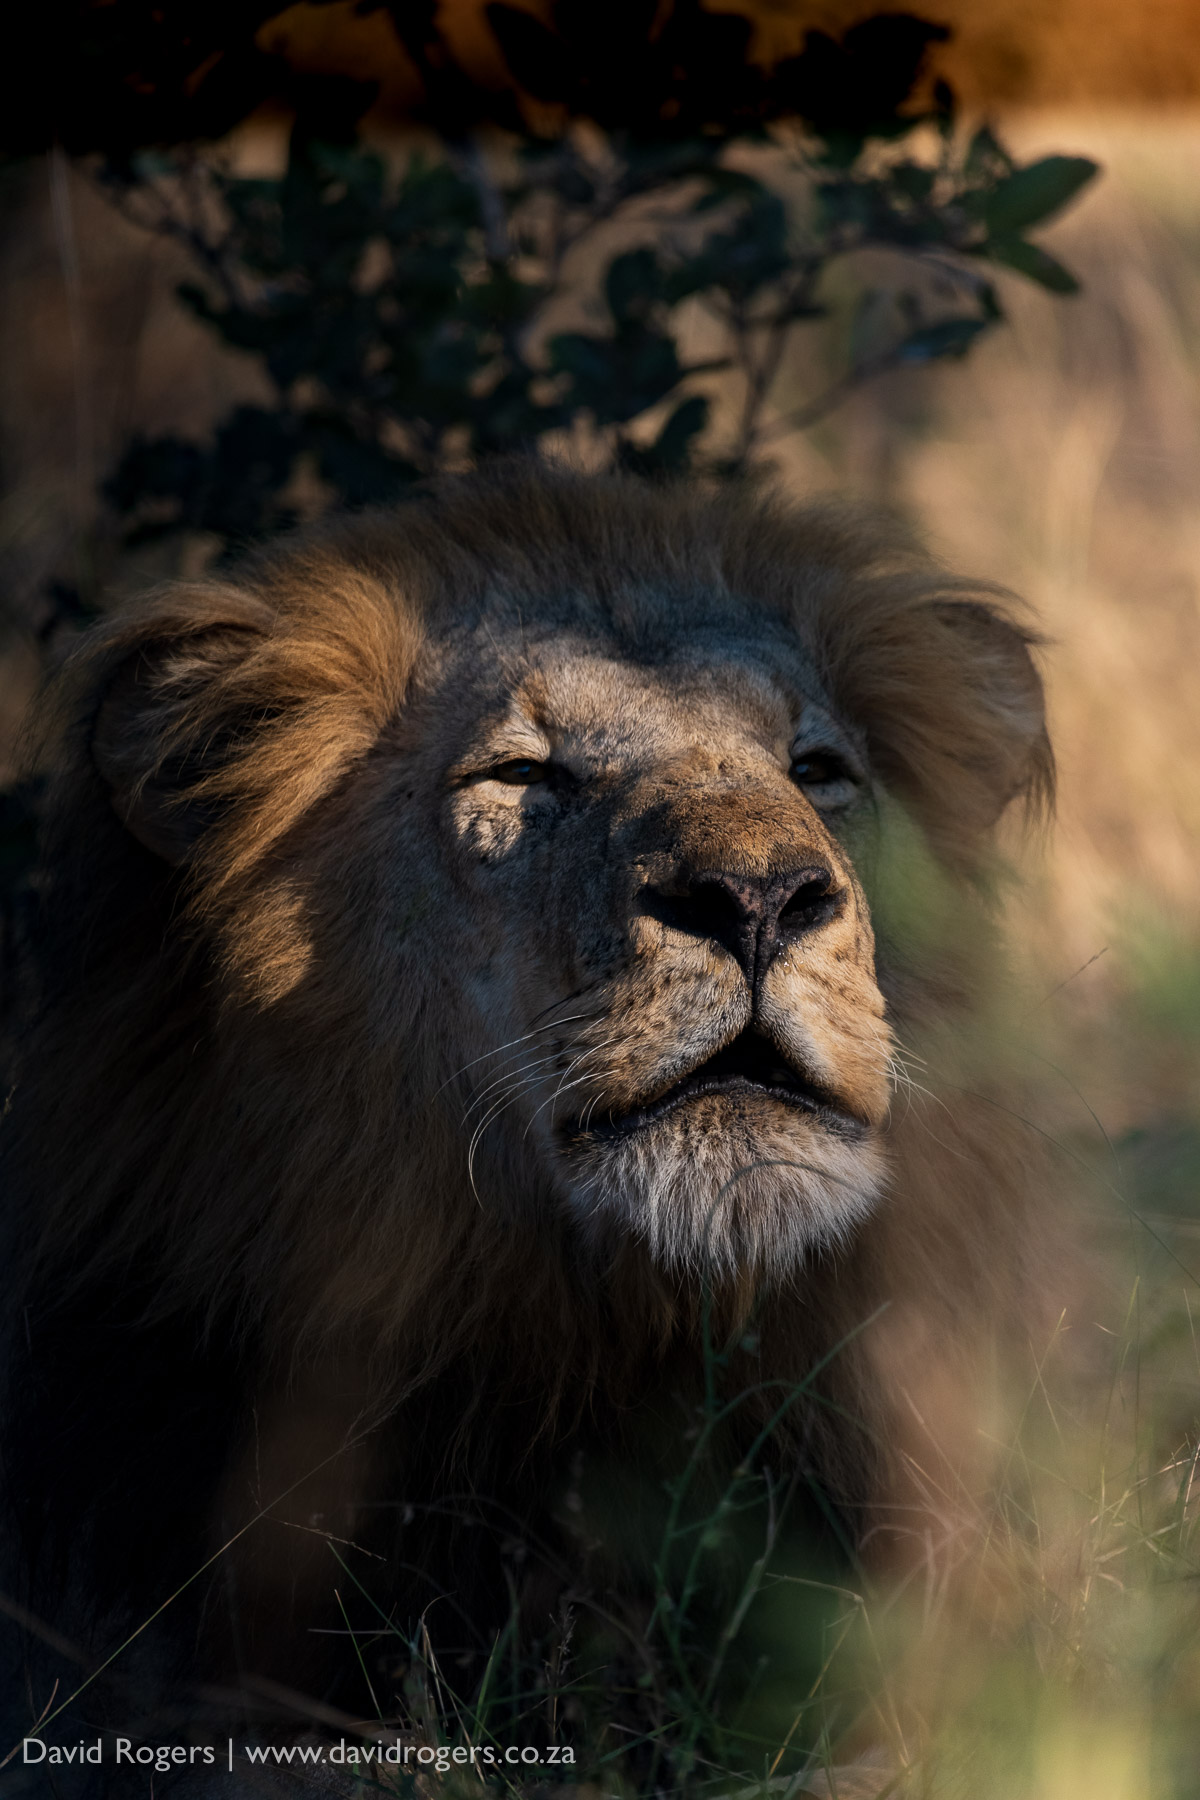 lion shot on the Sigma 60-600mm f/4.5-6.3 DG OS HSM Sports lens